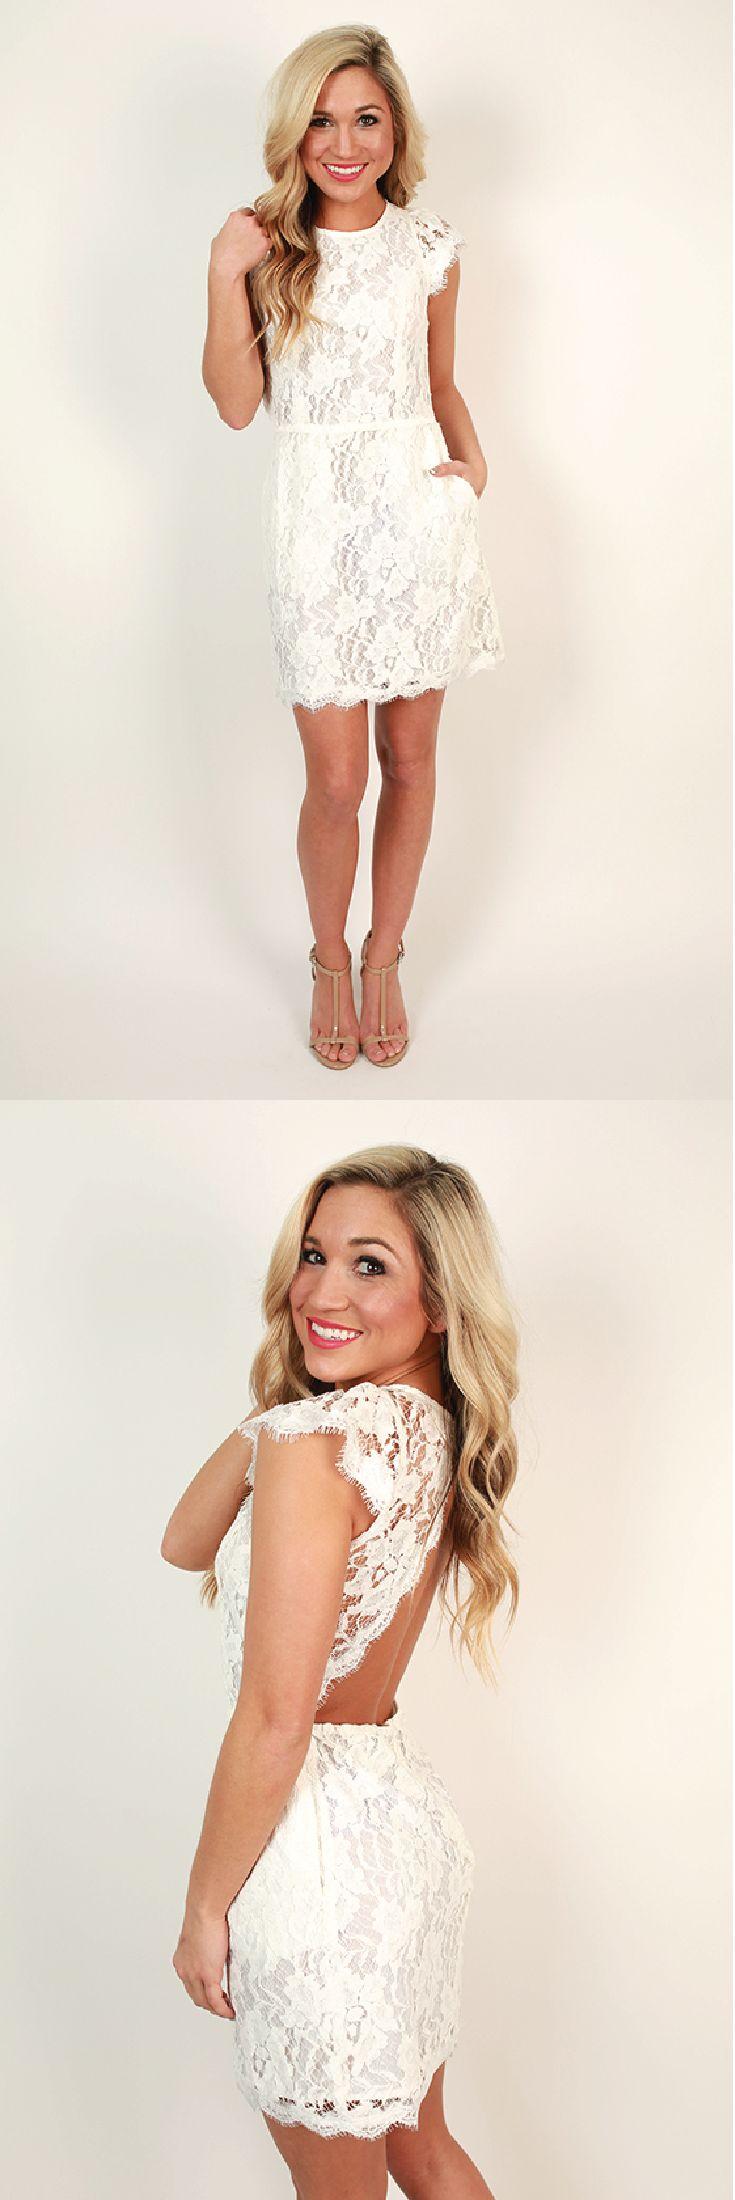 Best 25+ Bachelorette dresses ideas on Pinterest | Bachelorette ...